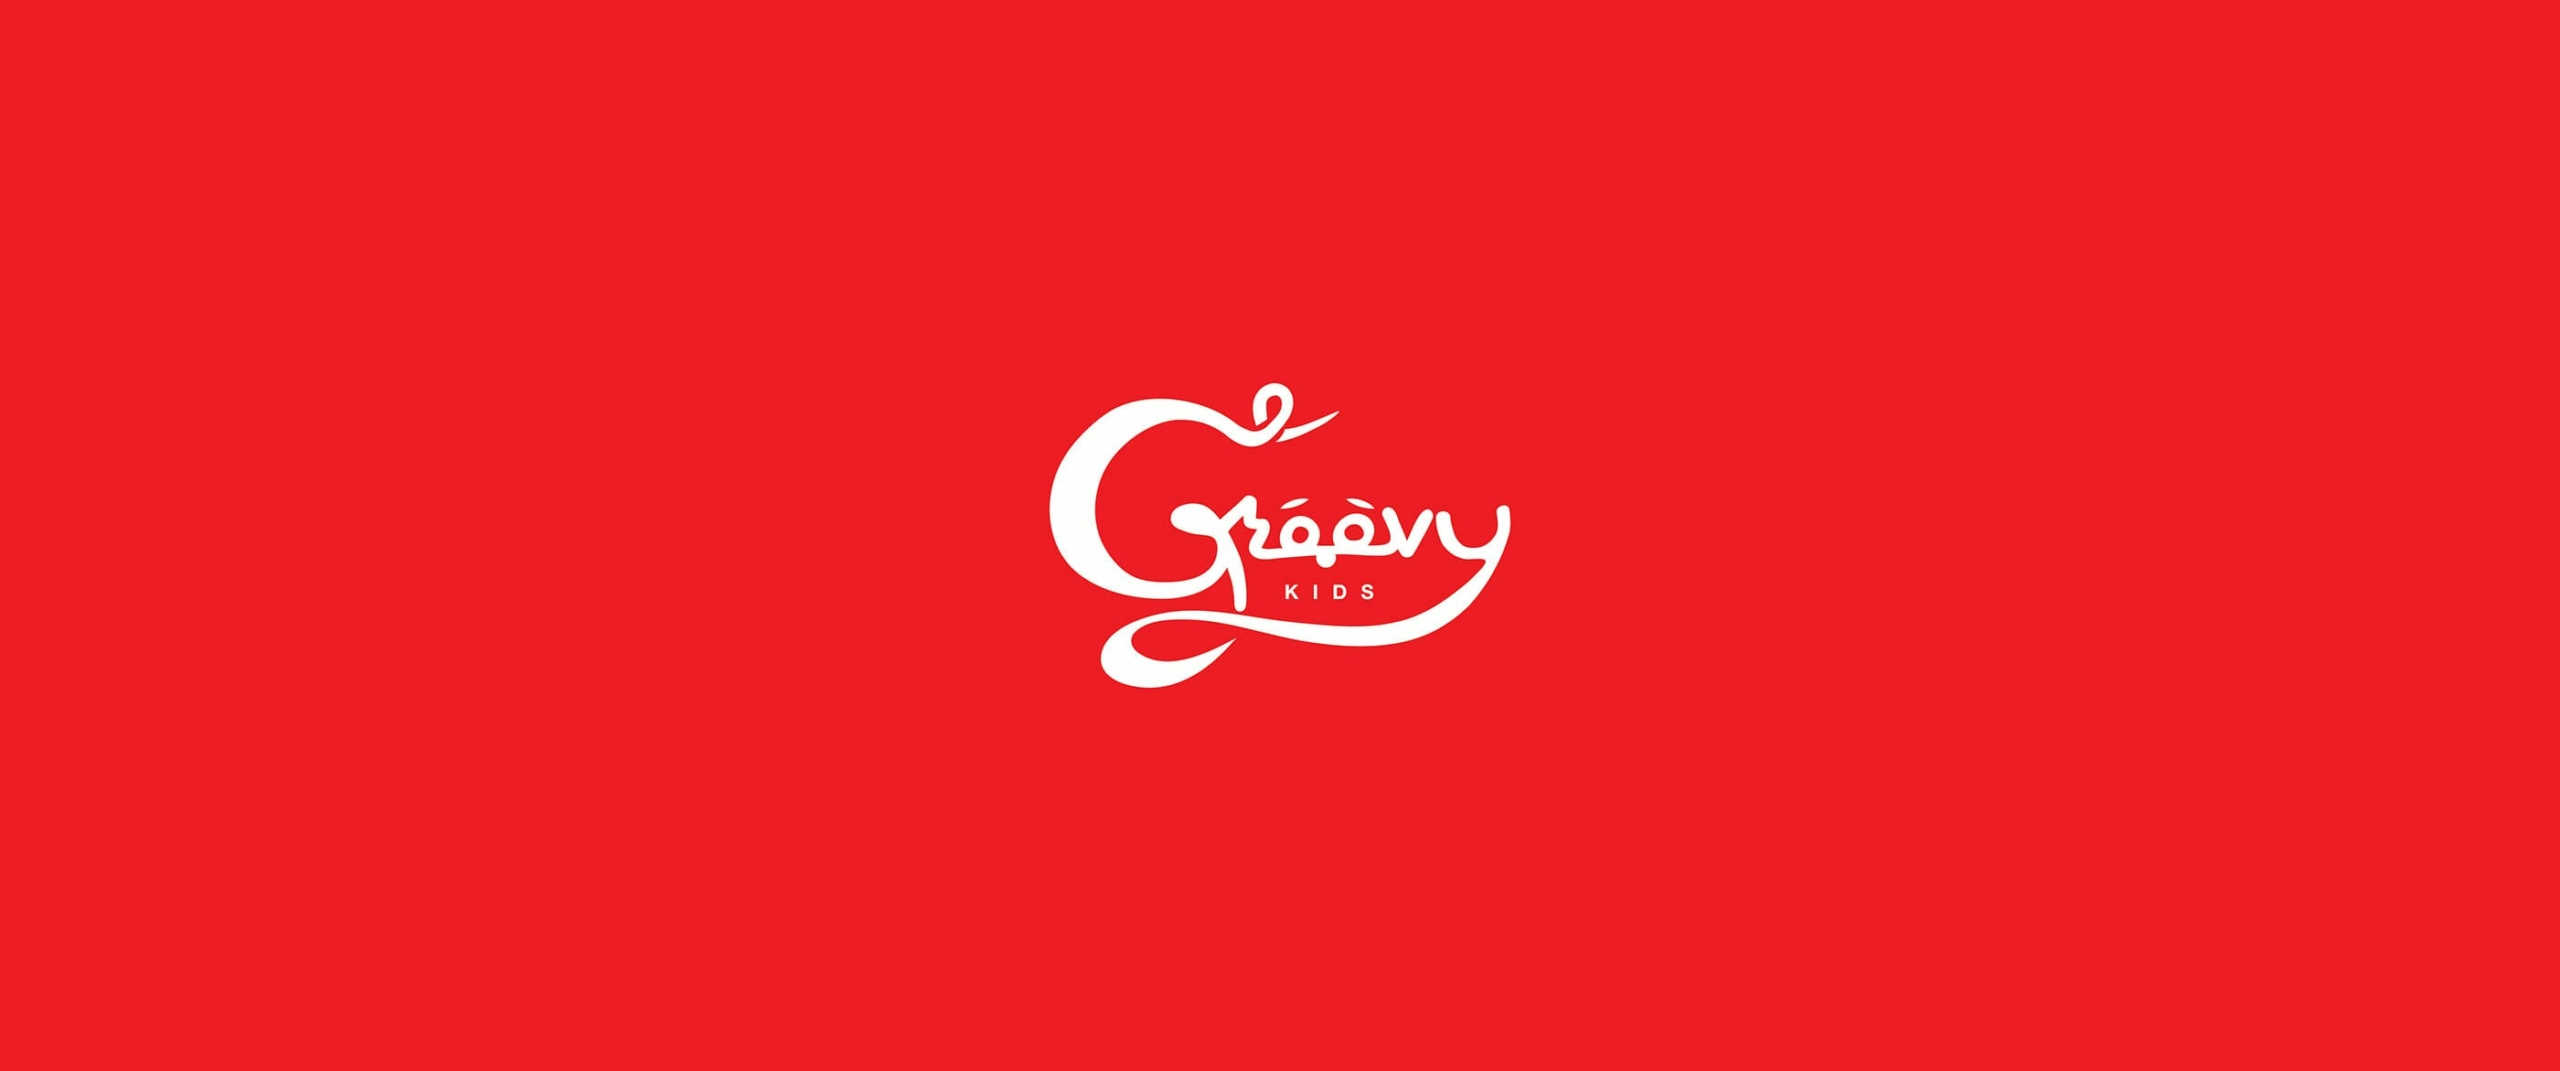 Groovy Kids logo